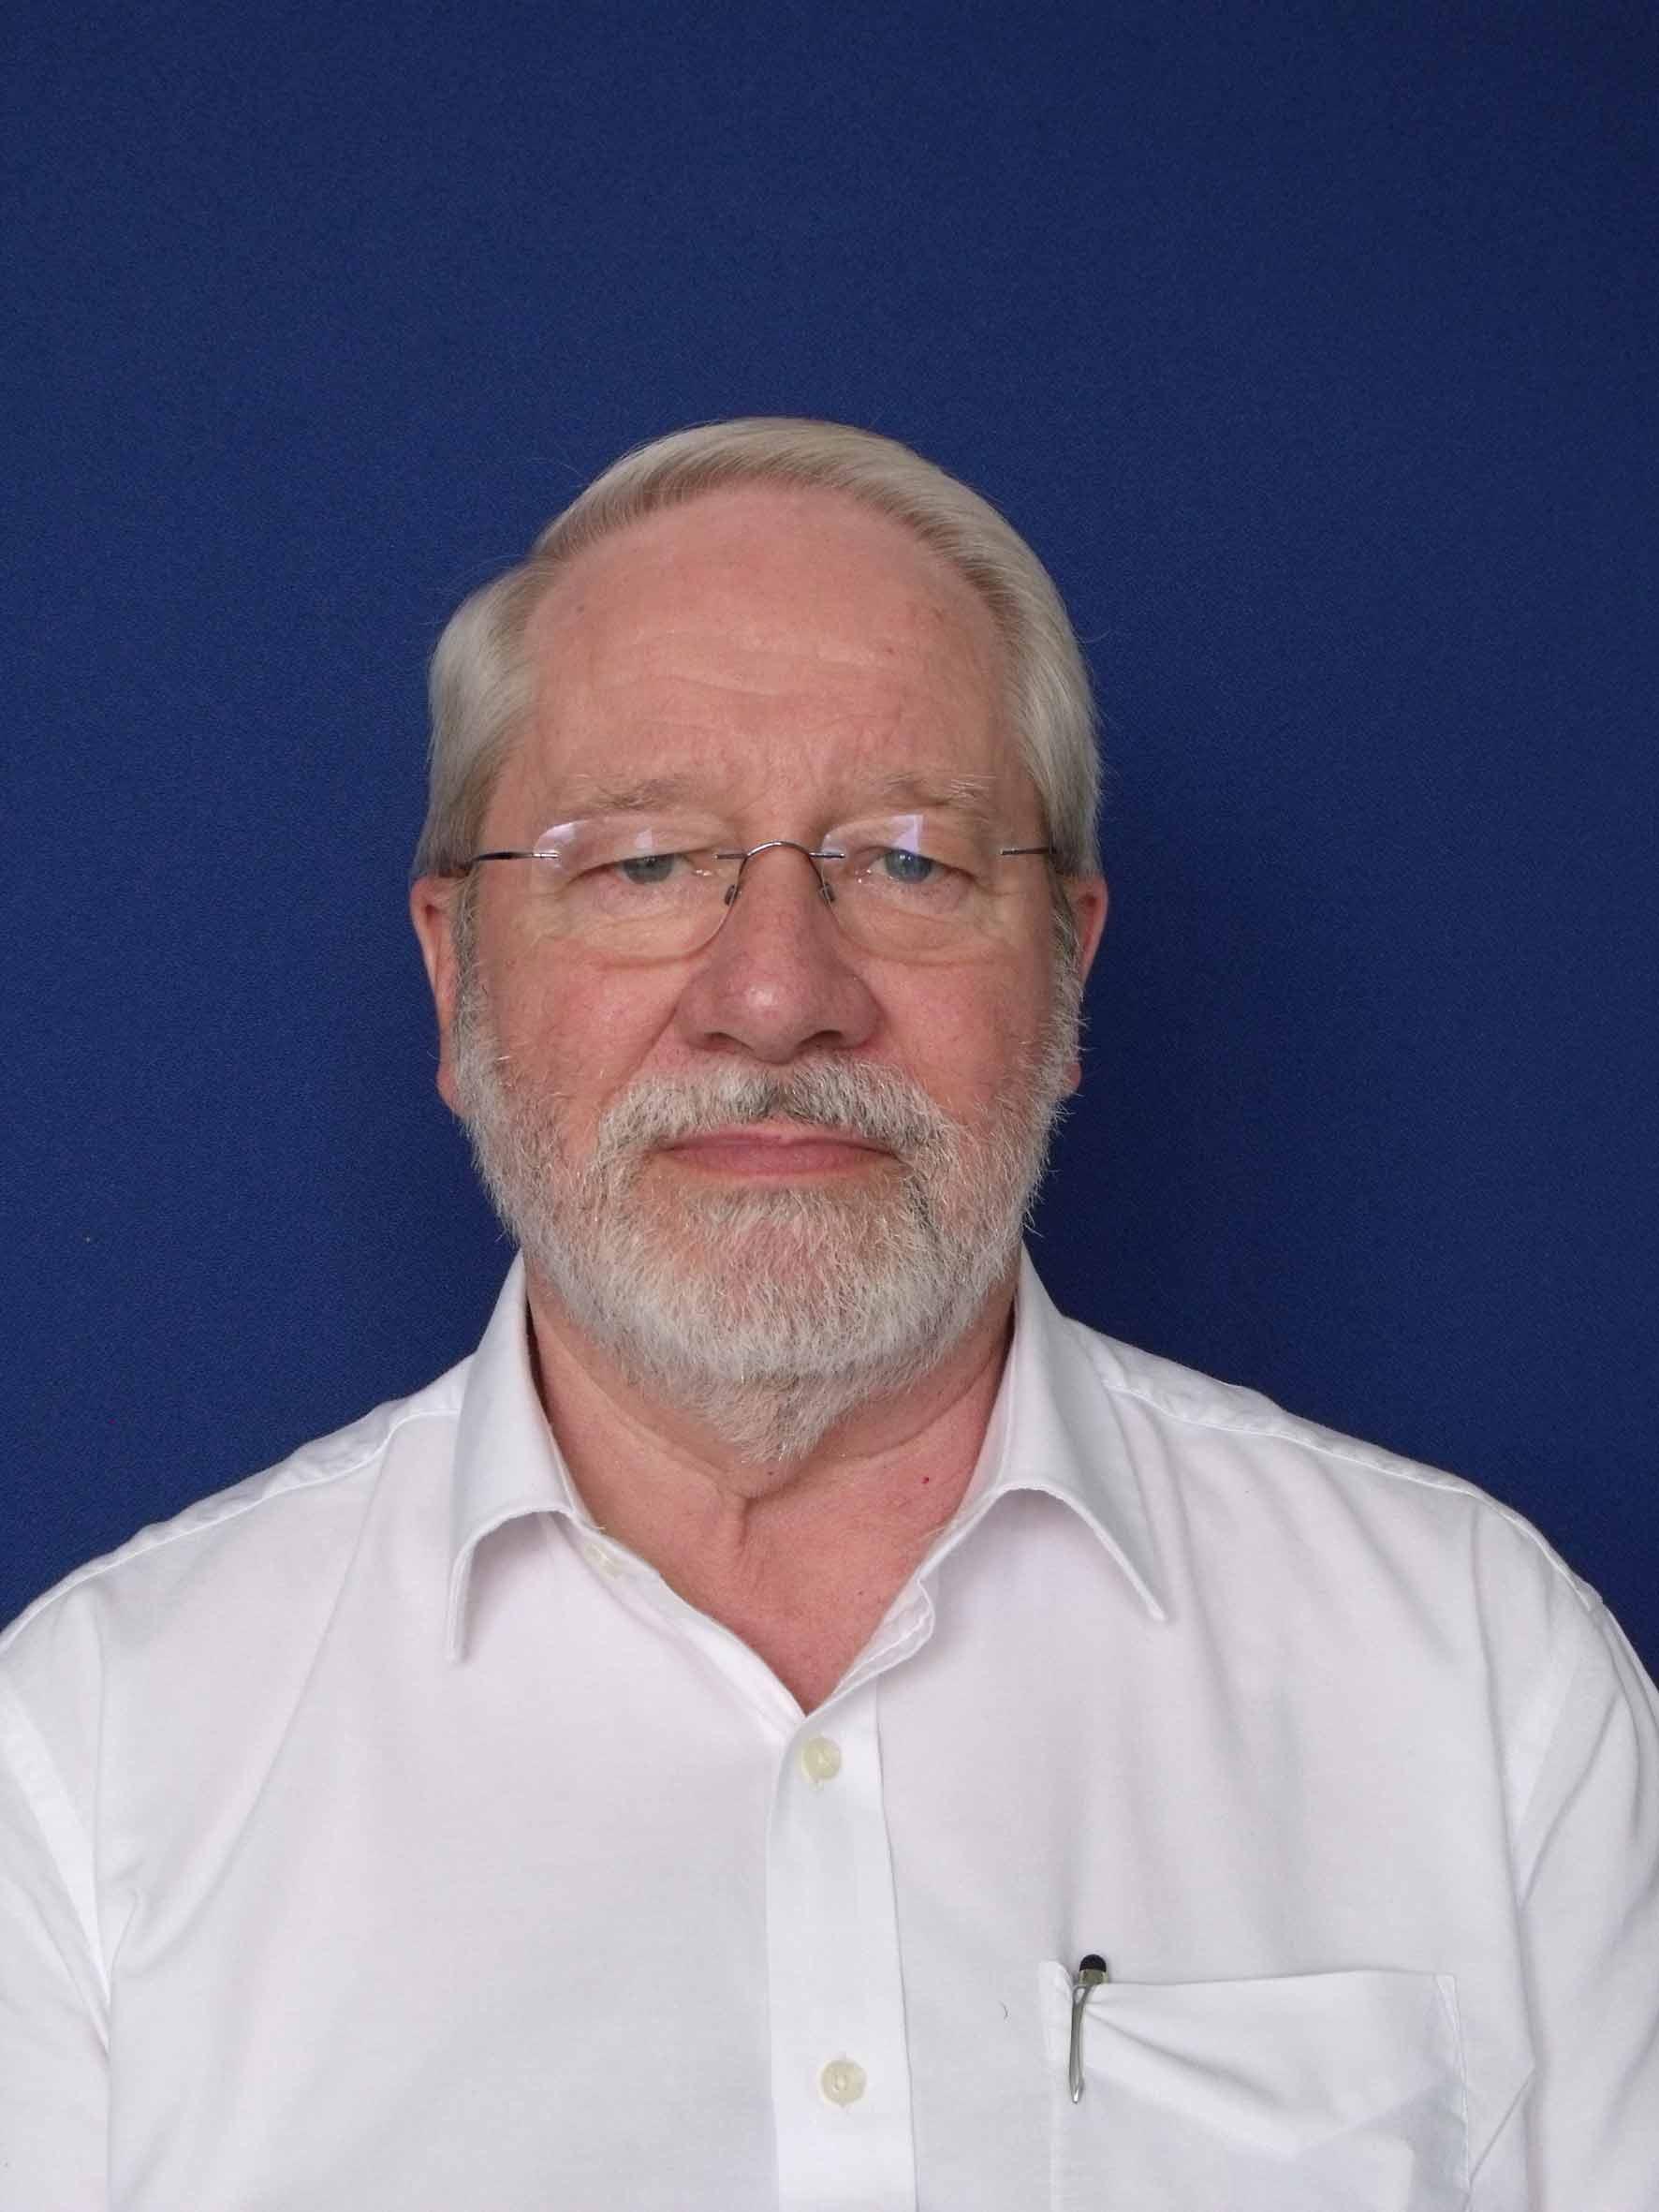 David-Thornley-1